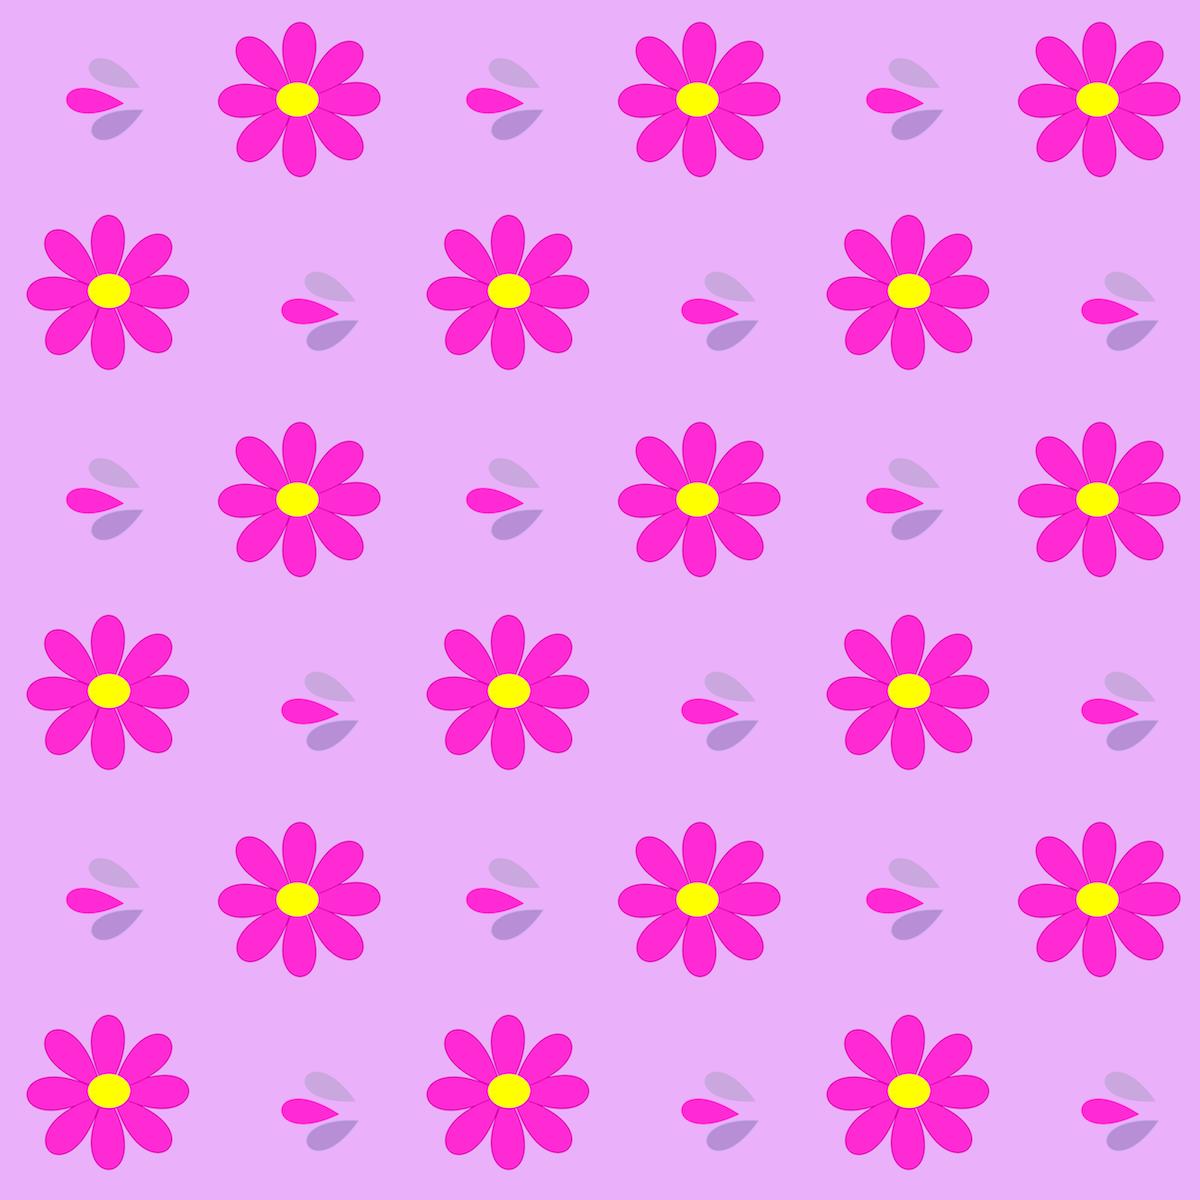 Pink Daisy Scrapbooking Free Digital Neon Pink Daisy